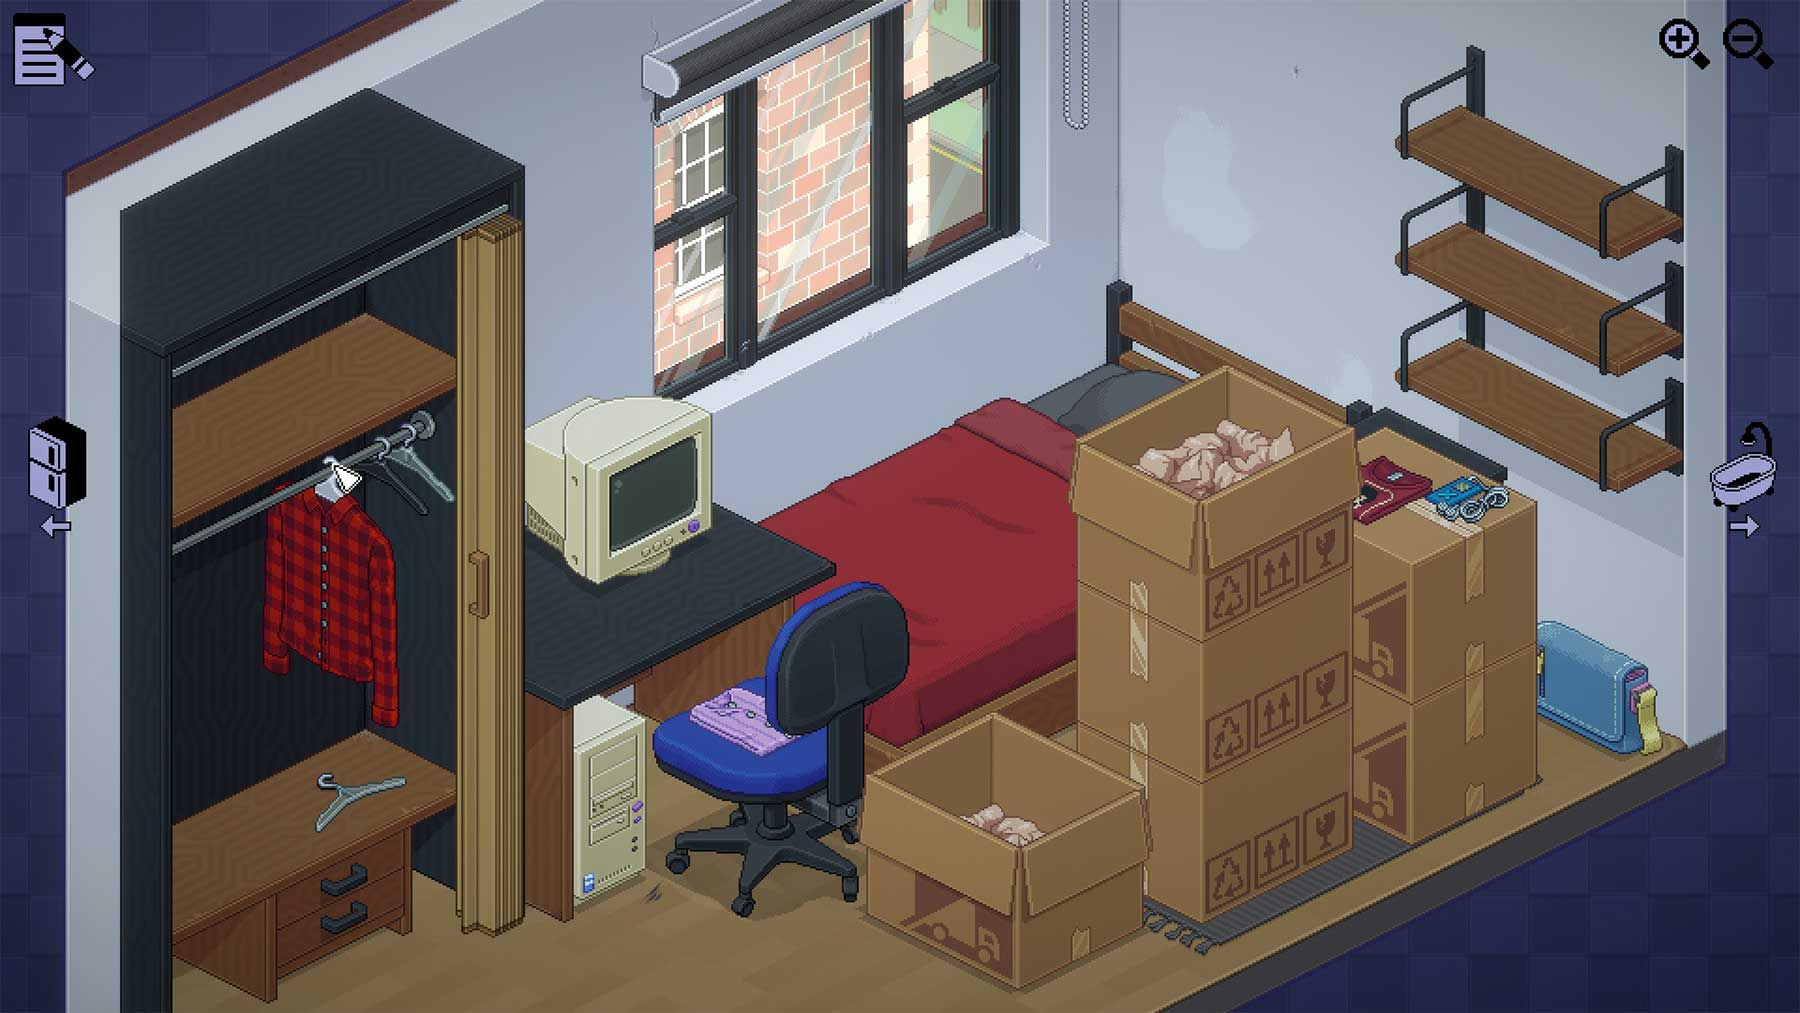 Umzugskartons auspacken, das Videospiel